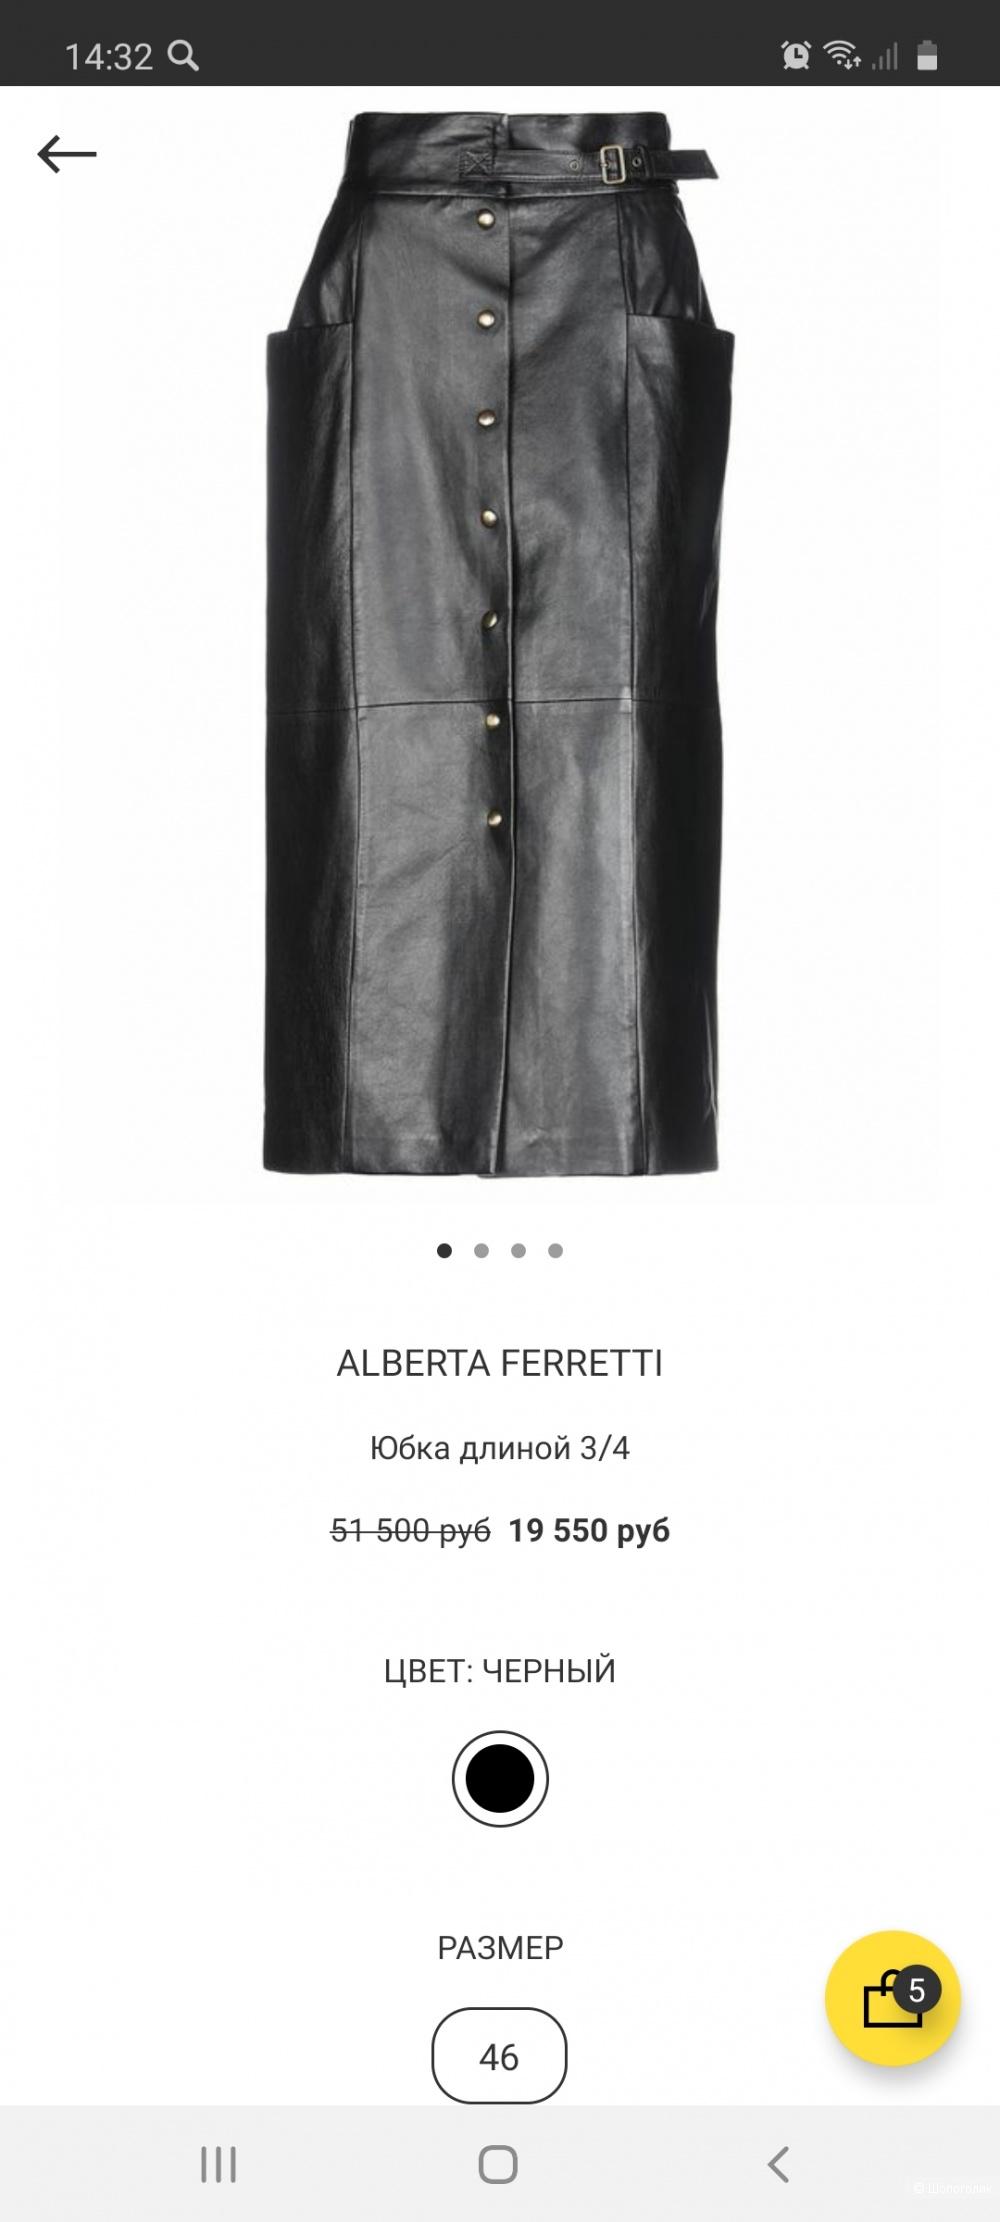 Юбка кожаная  ALBERTA FERRETTI  размер 46 (44 it).